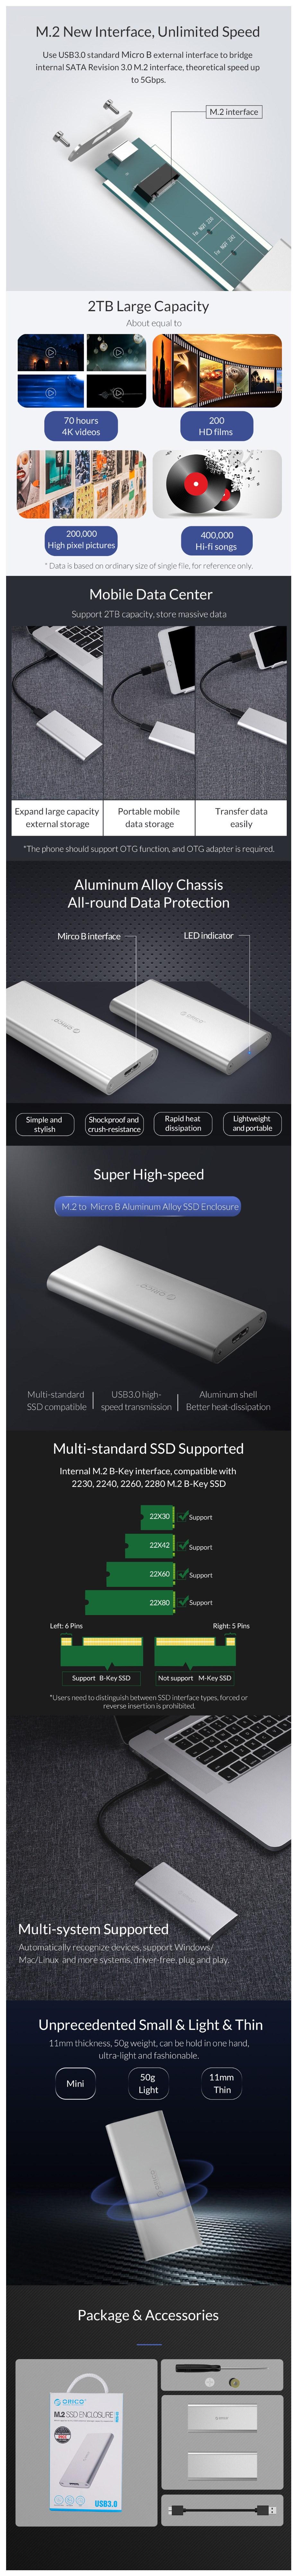 Orico M2G-U3 M.2 B-Key SSD to USB 3.0 Enclosure - Silver - Overview 1